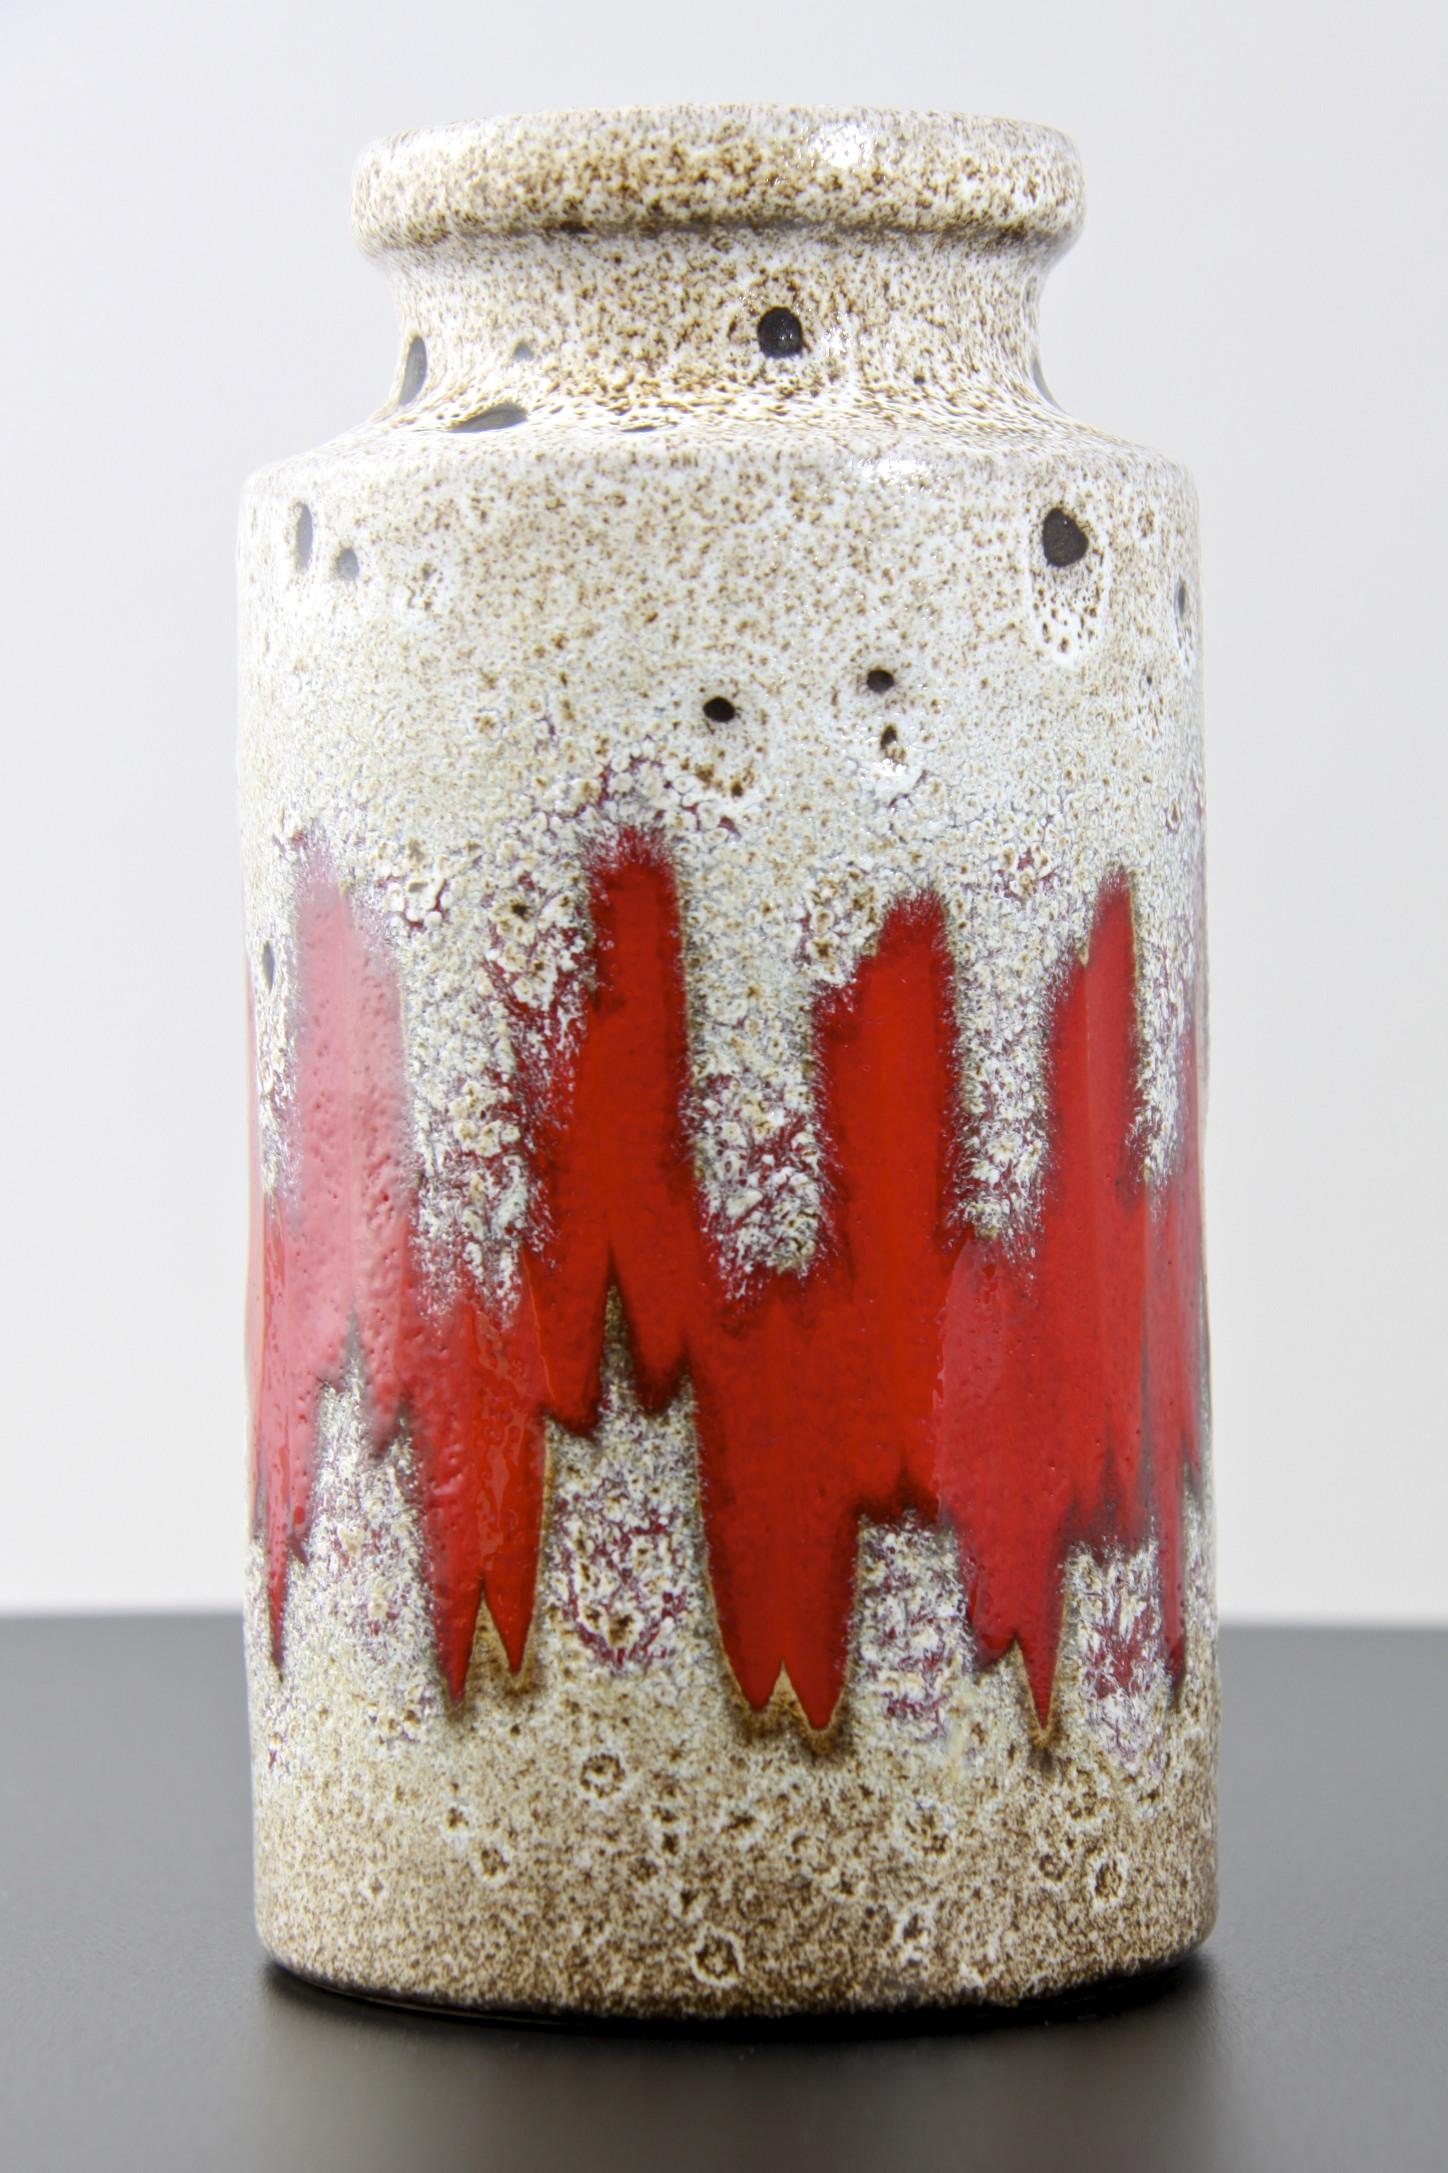 1970s Vintage SCHEURICH KERAMIK White Fat Lava Vase with Floral decor 27122 by Heinz Siery West German Pottery